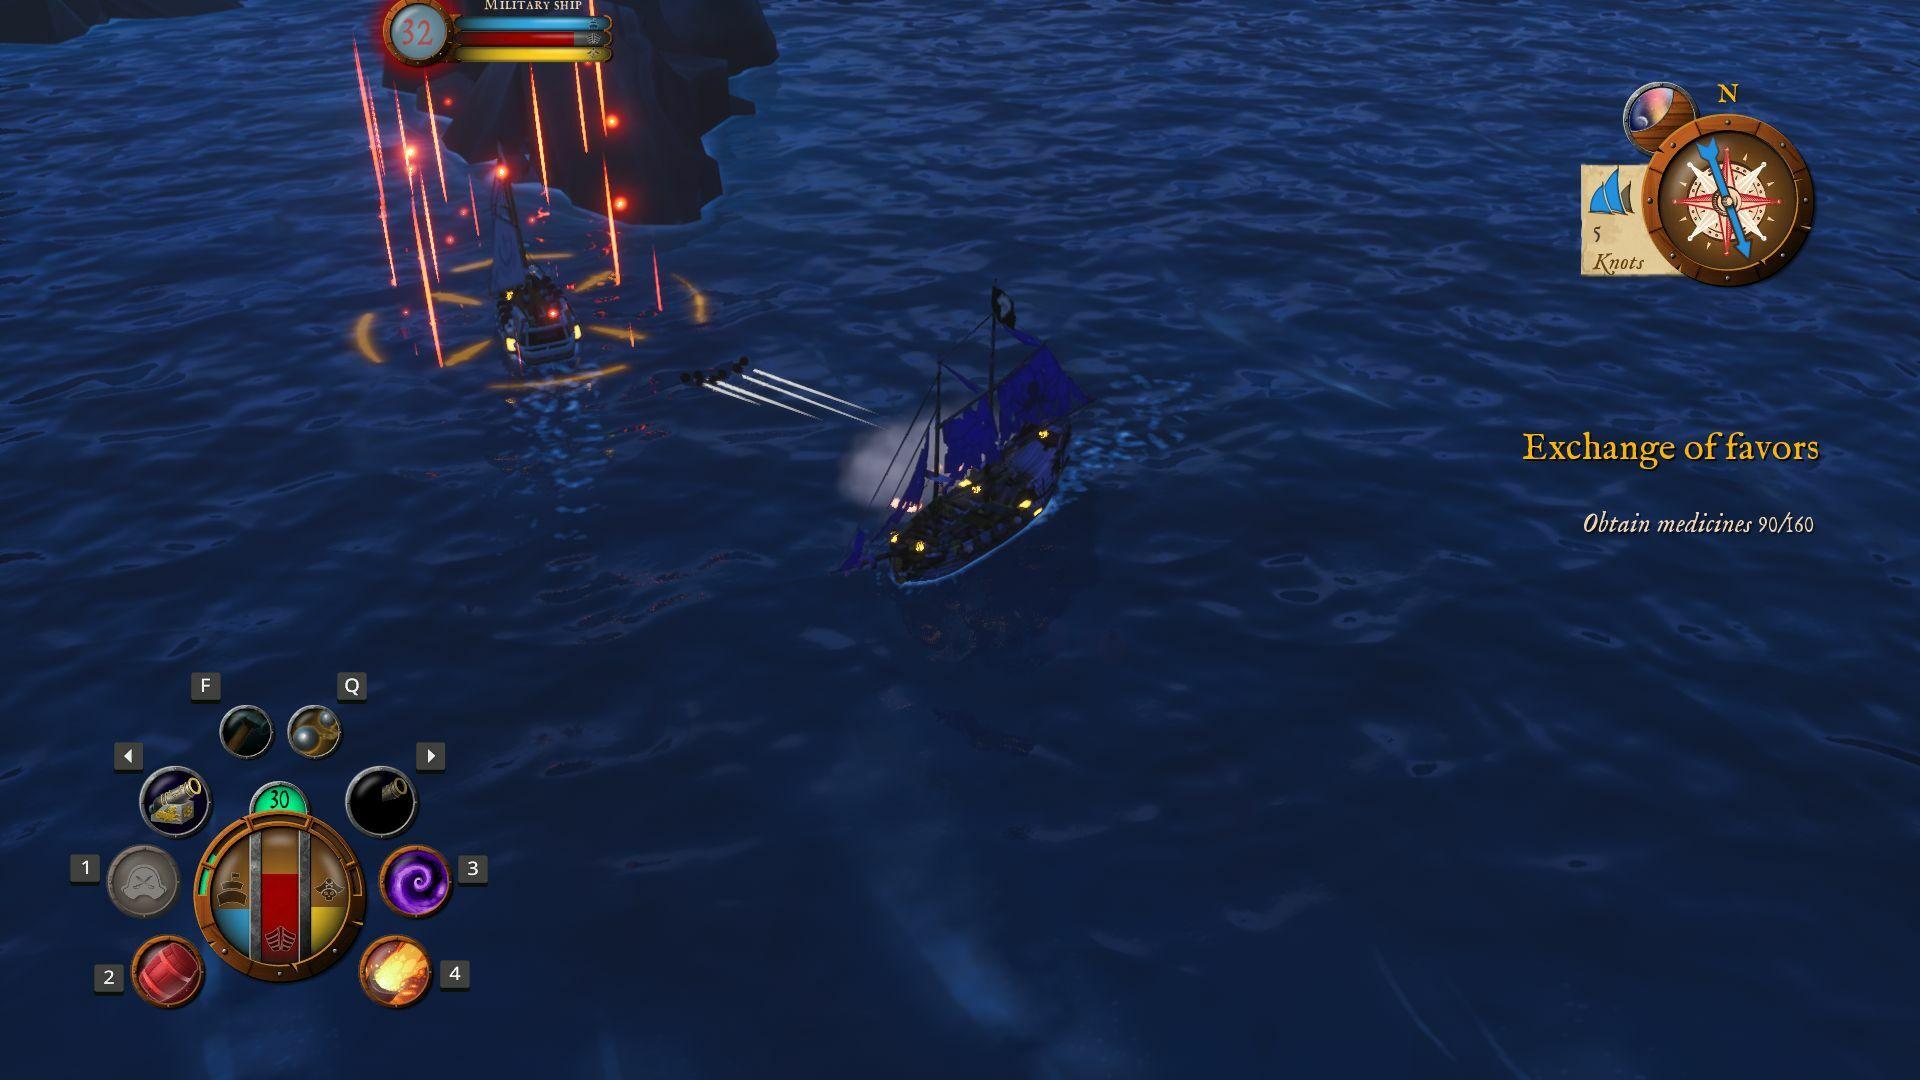 king-of-seas-pc-screenshot-3